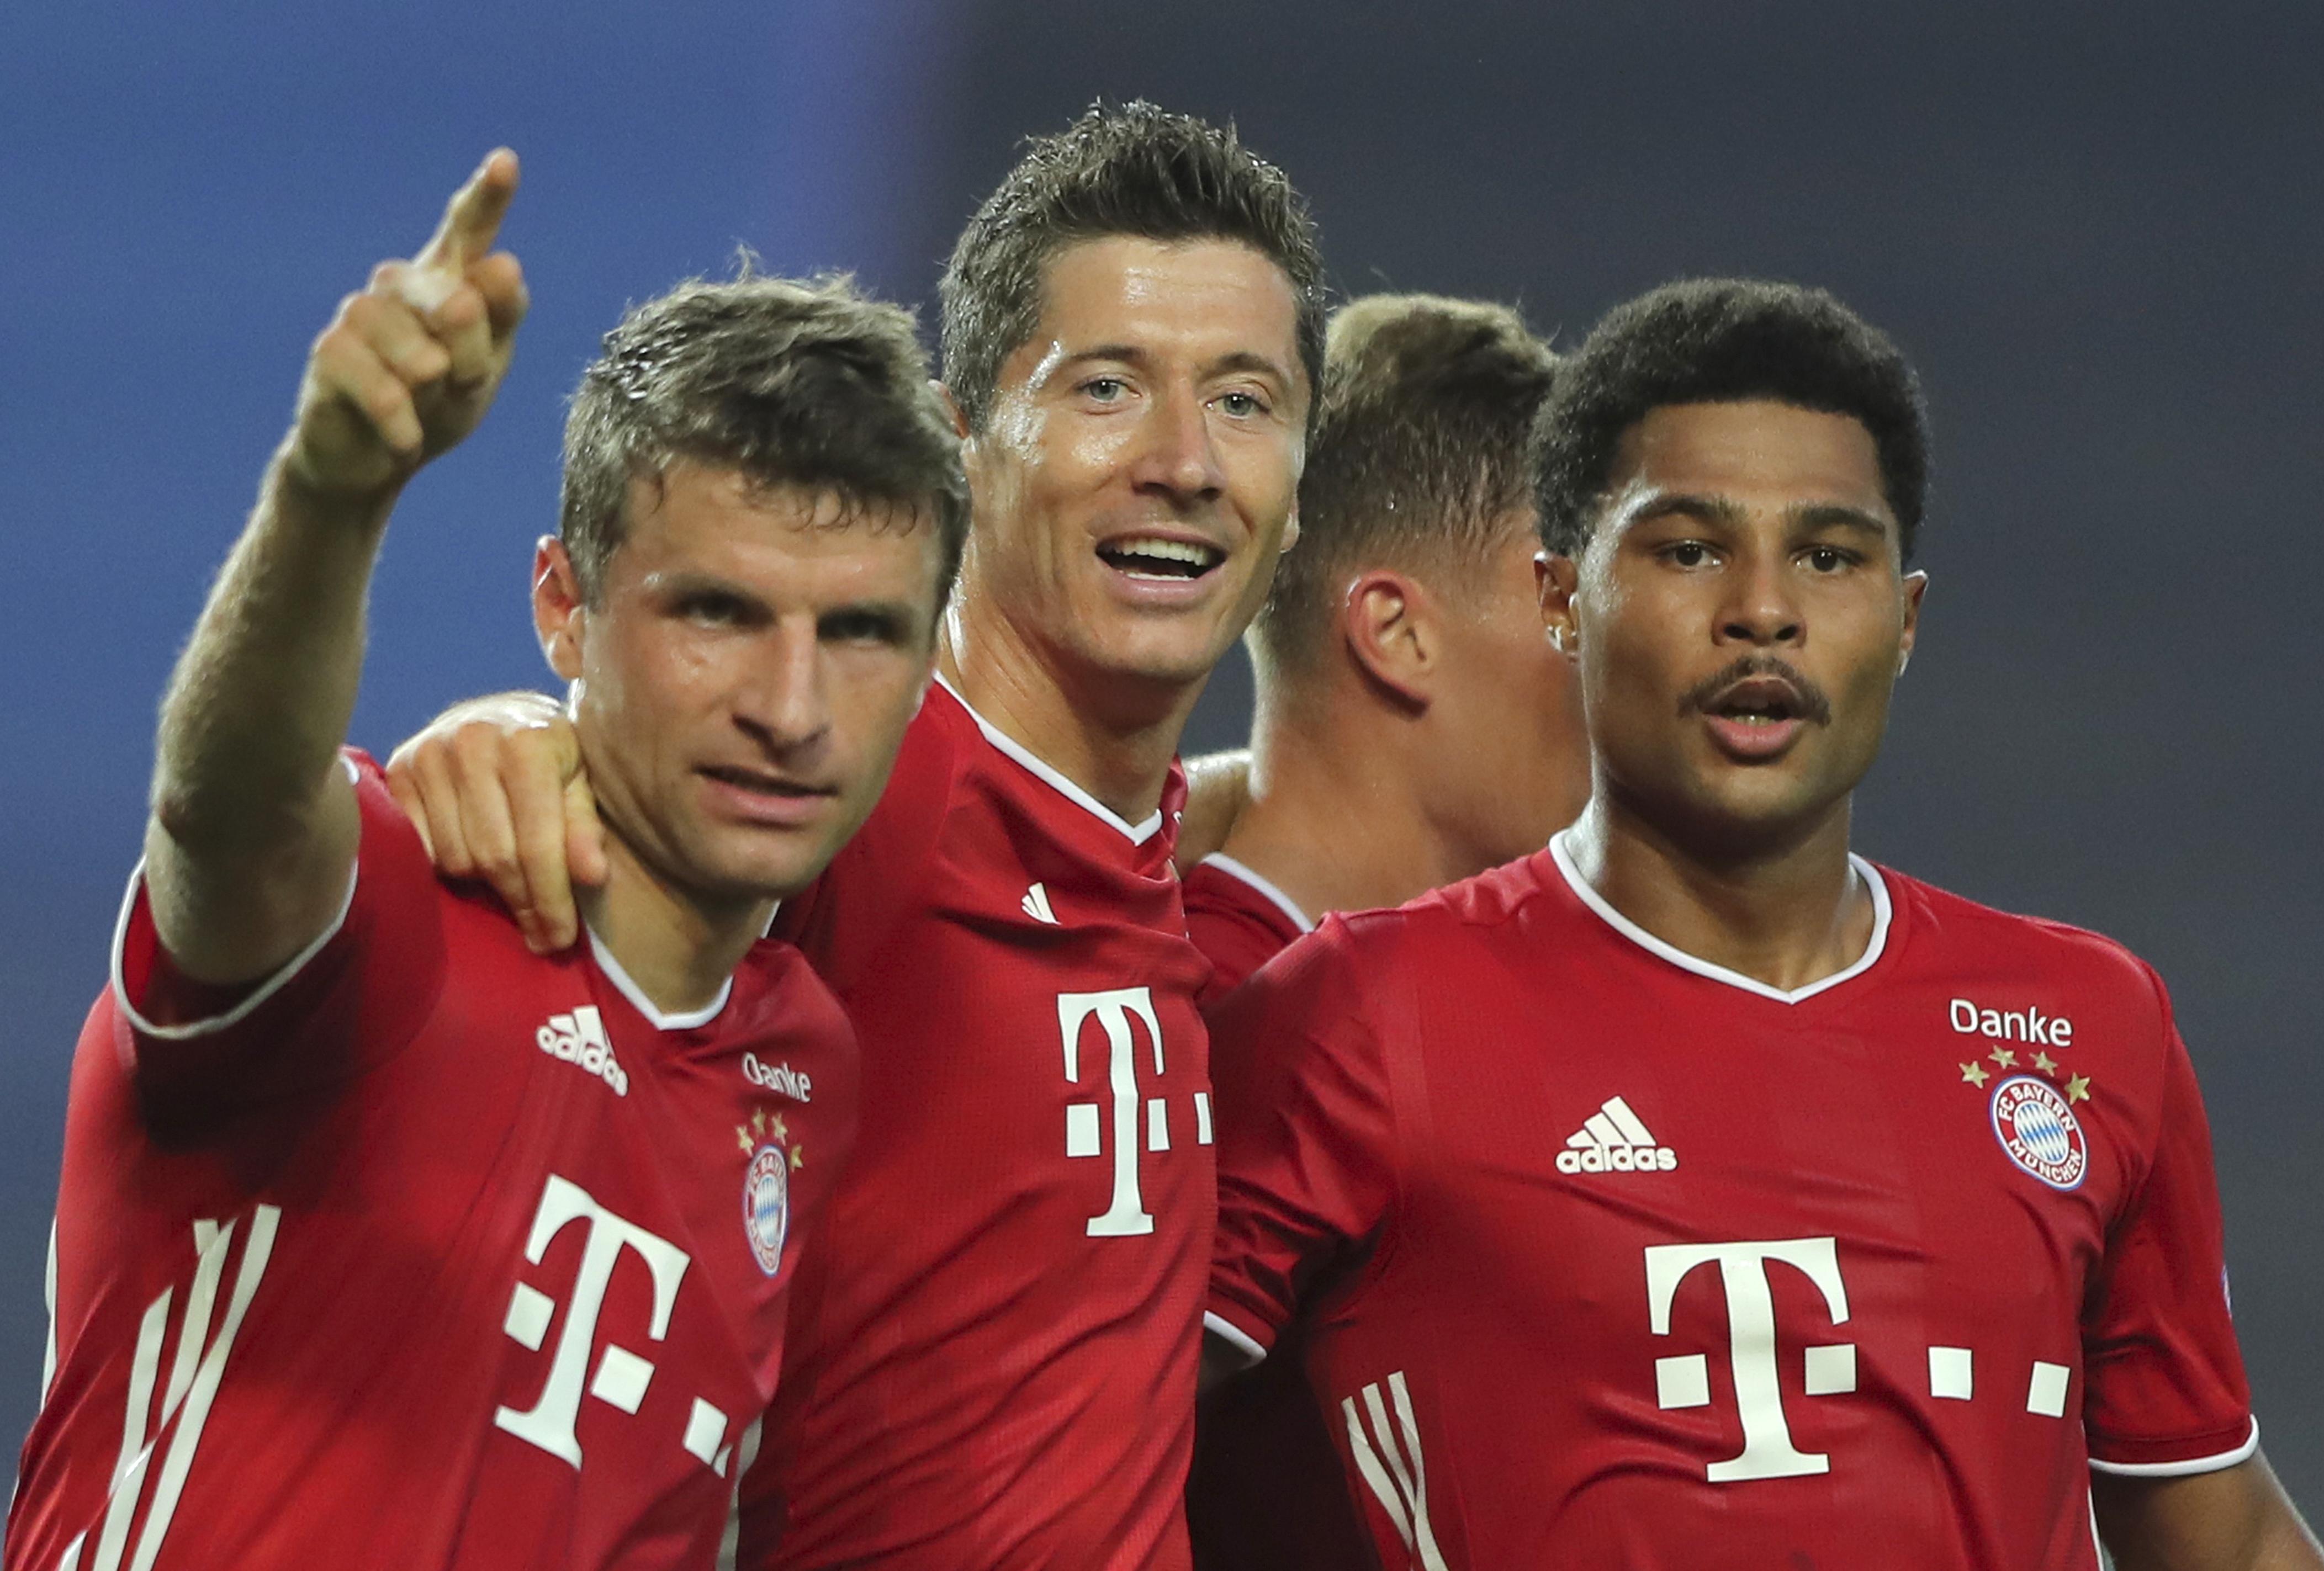 Paris Saint Germain Vs Bayern Munich Live Stream Start Time Tv Channel How To Watch Champions League Final 2020 Masslive Com